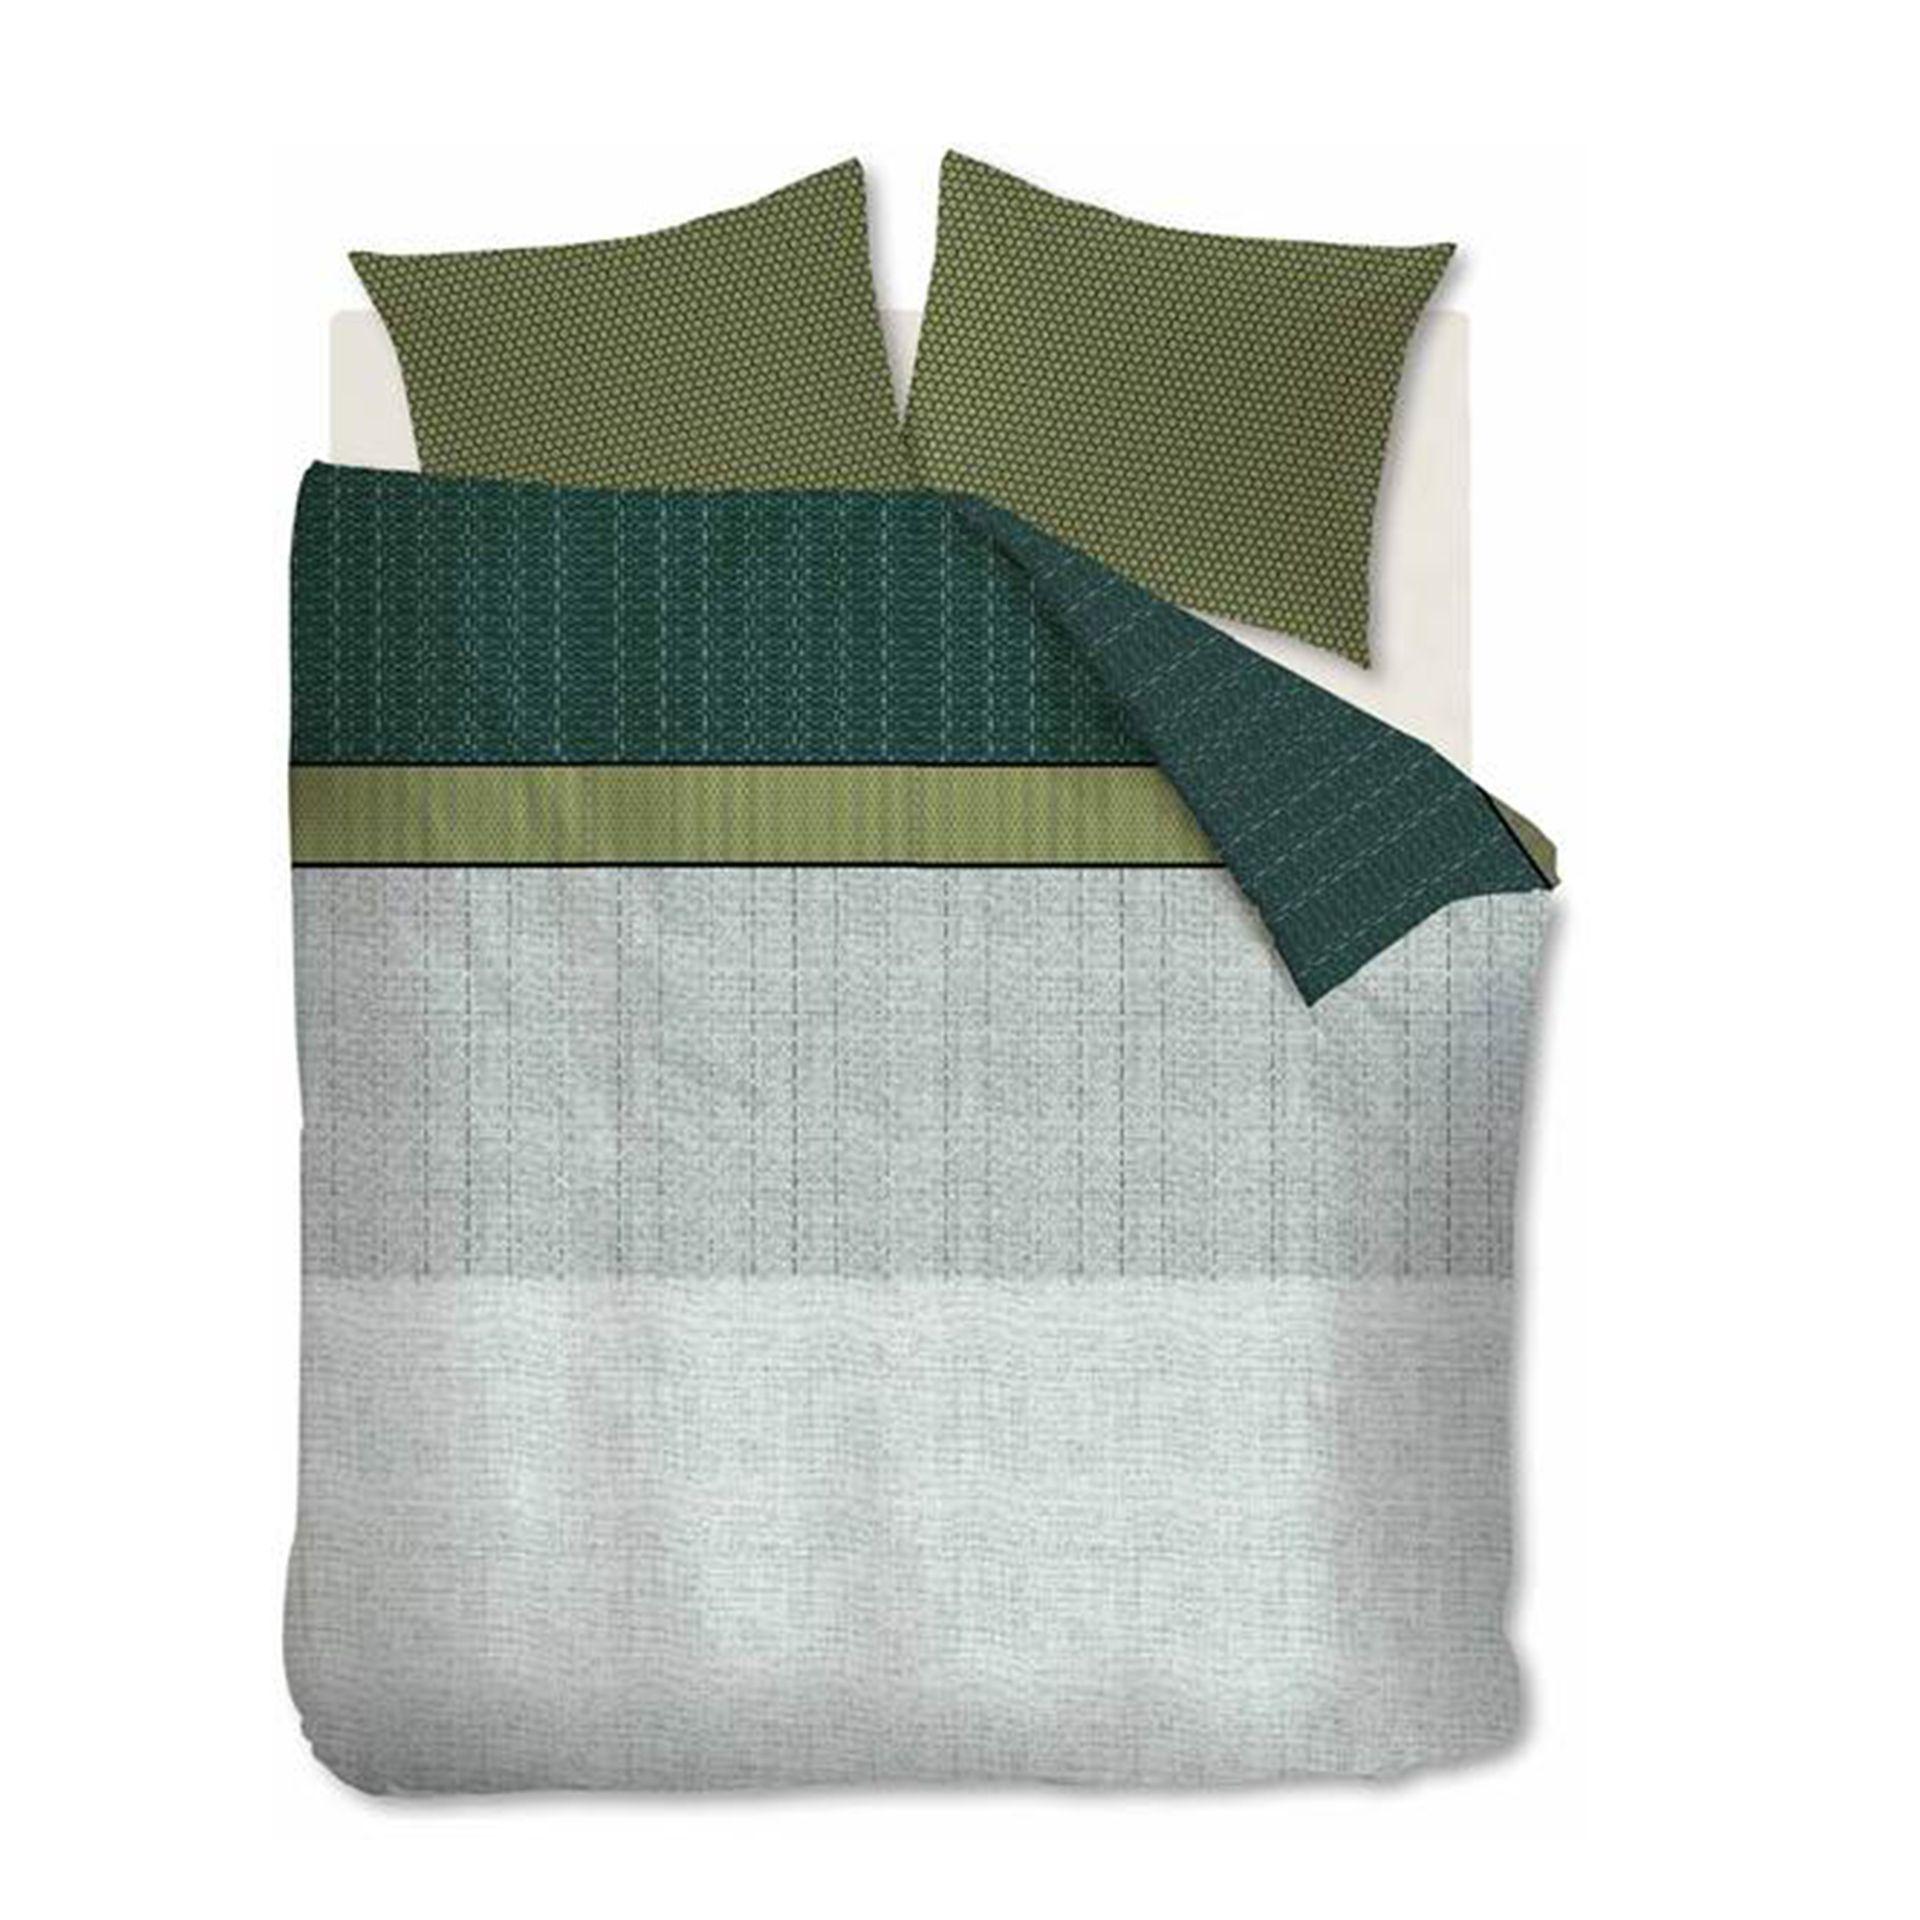 Beddinghouse - Camaro green dekbedovertrek